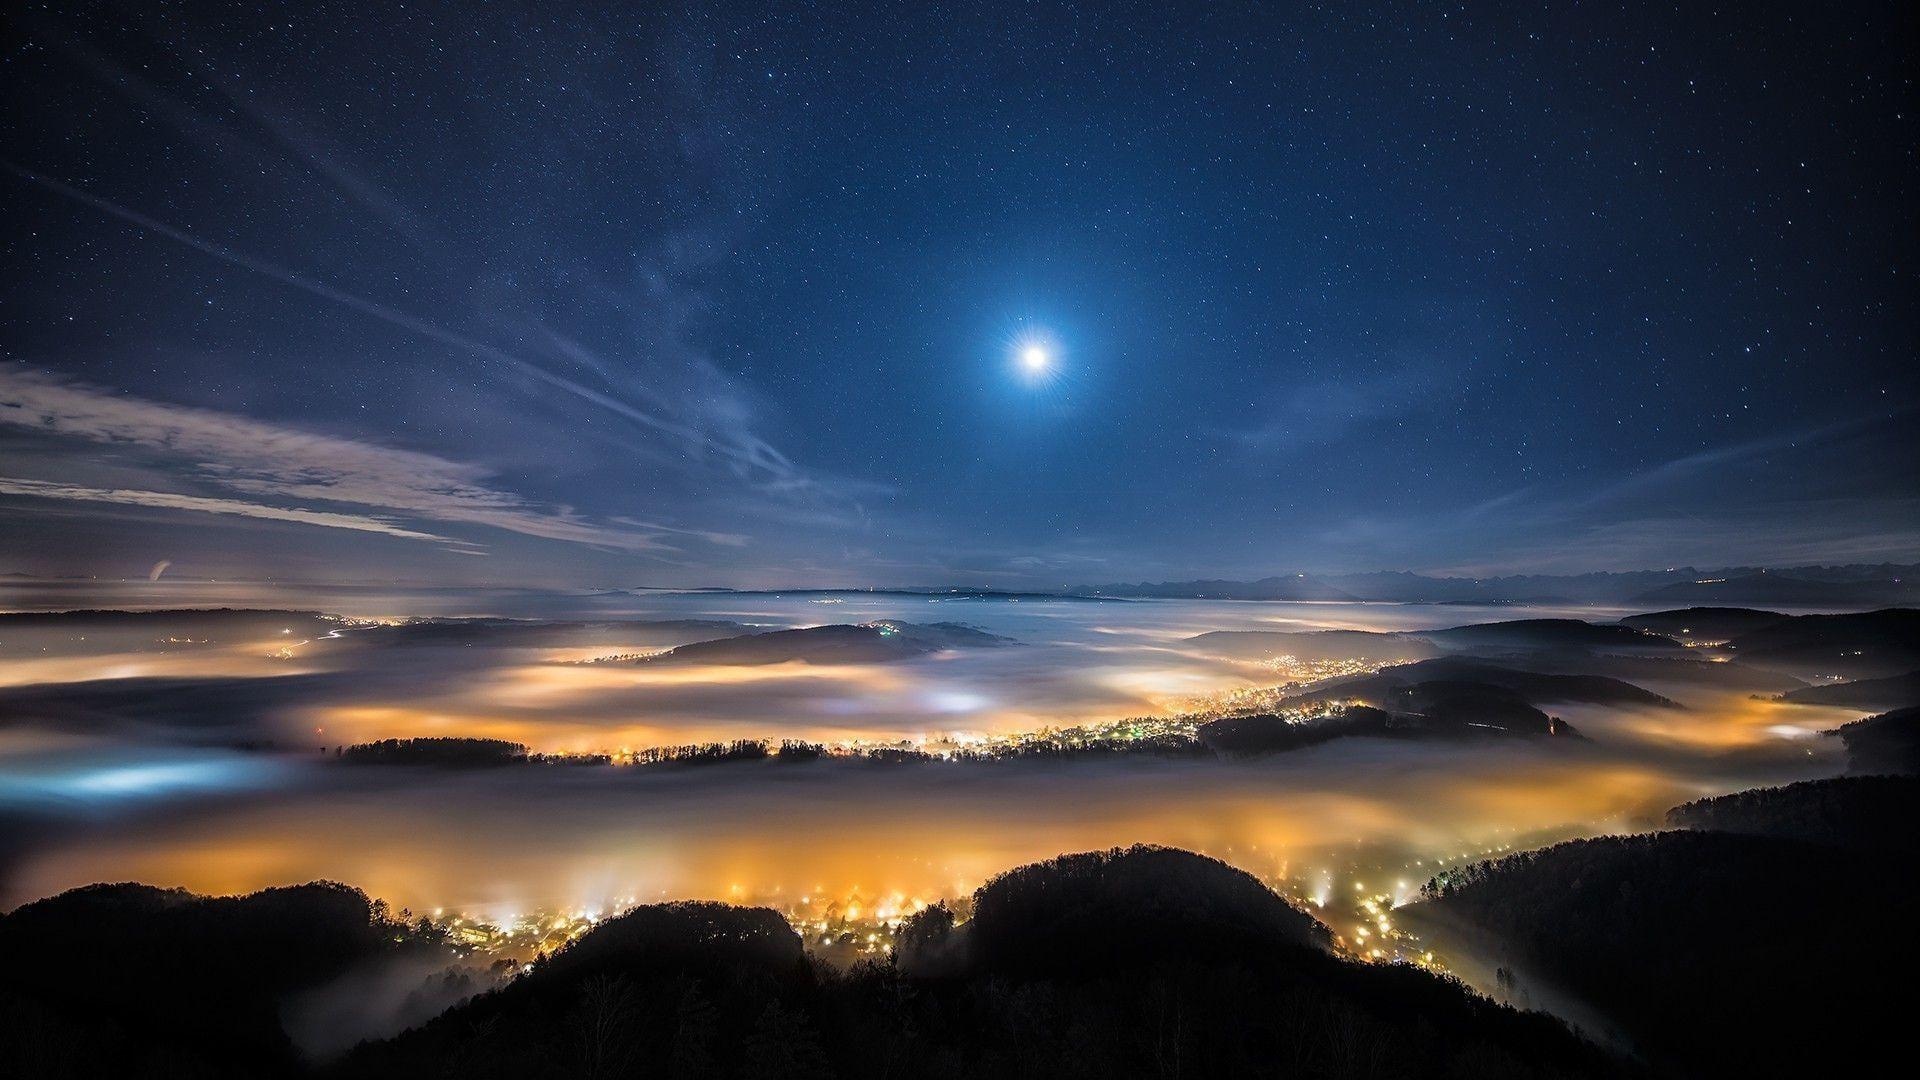 Night Sky Moon Star City Valley Mountain World 1920x1080 1080p Wallpaper Hdwallpaper Desktop Landscape Nature Pictures Night Skies 1080p night sky moon wallpaper hd